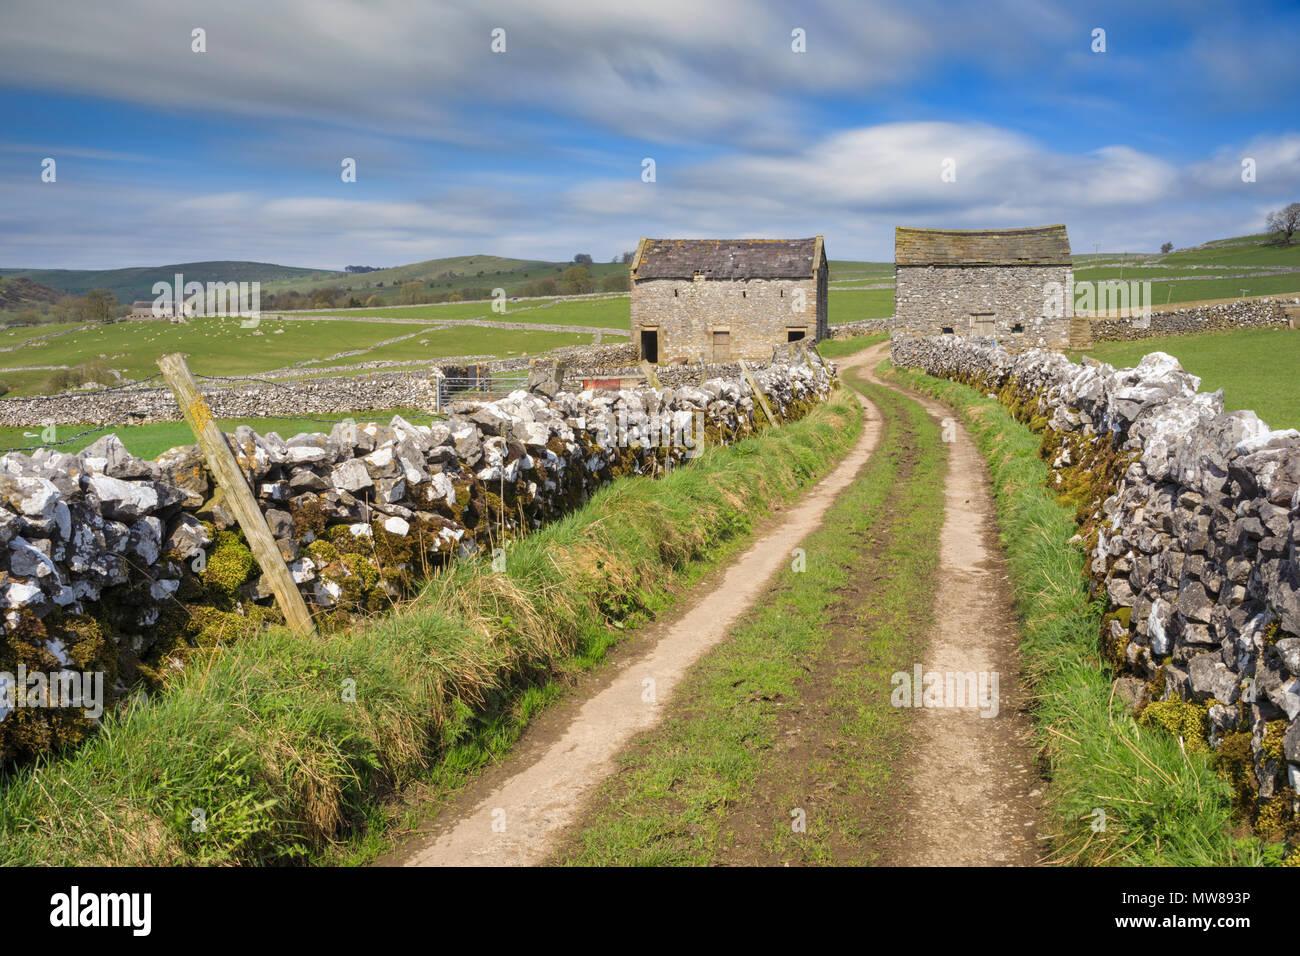 Barns near Hartington in the Peak District National Park. - Stock Image